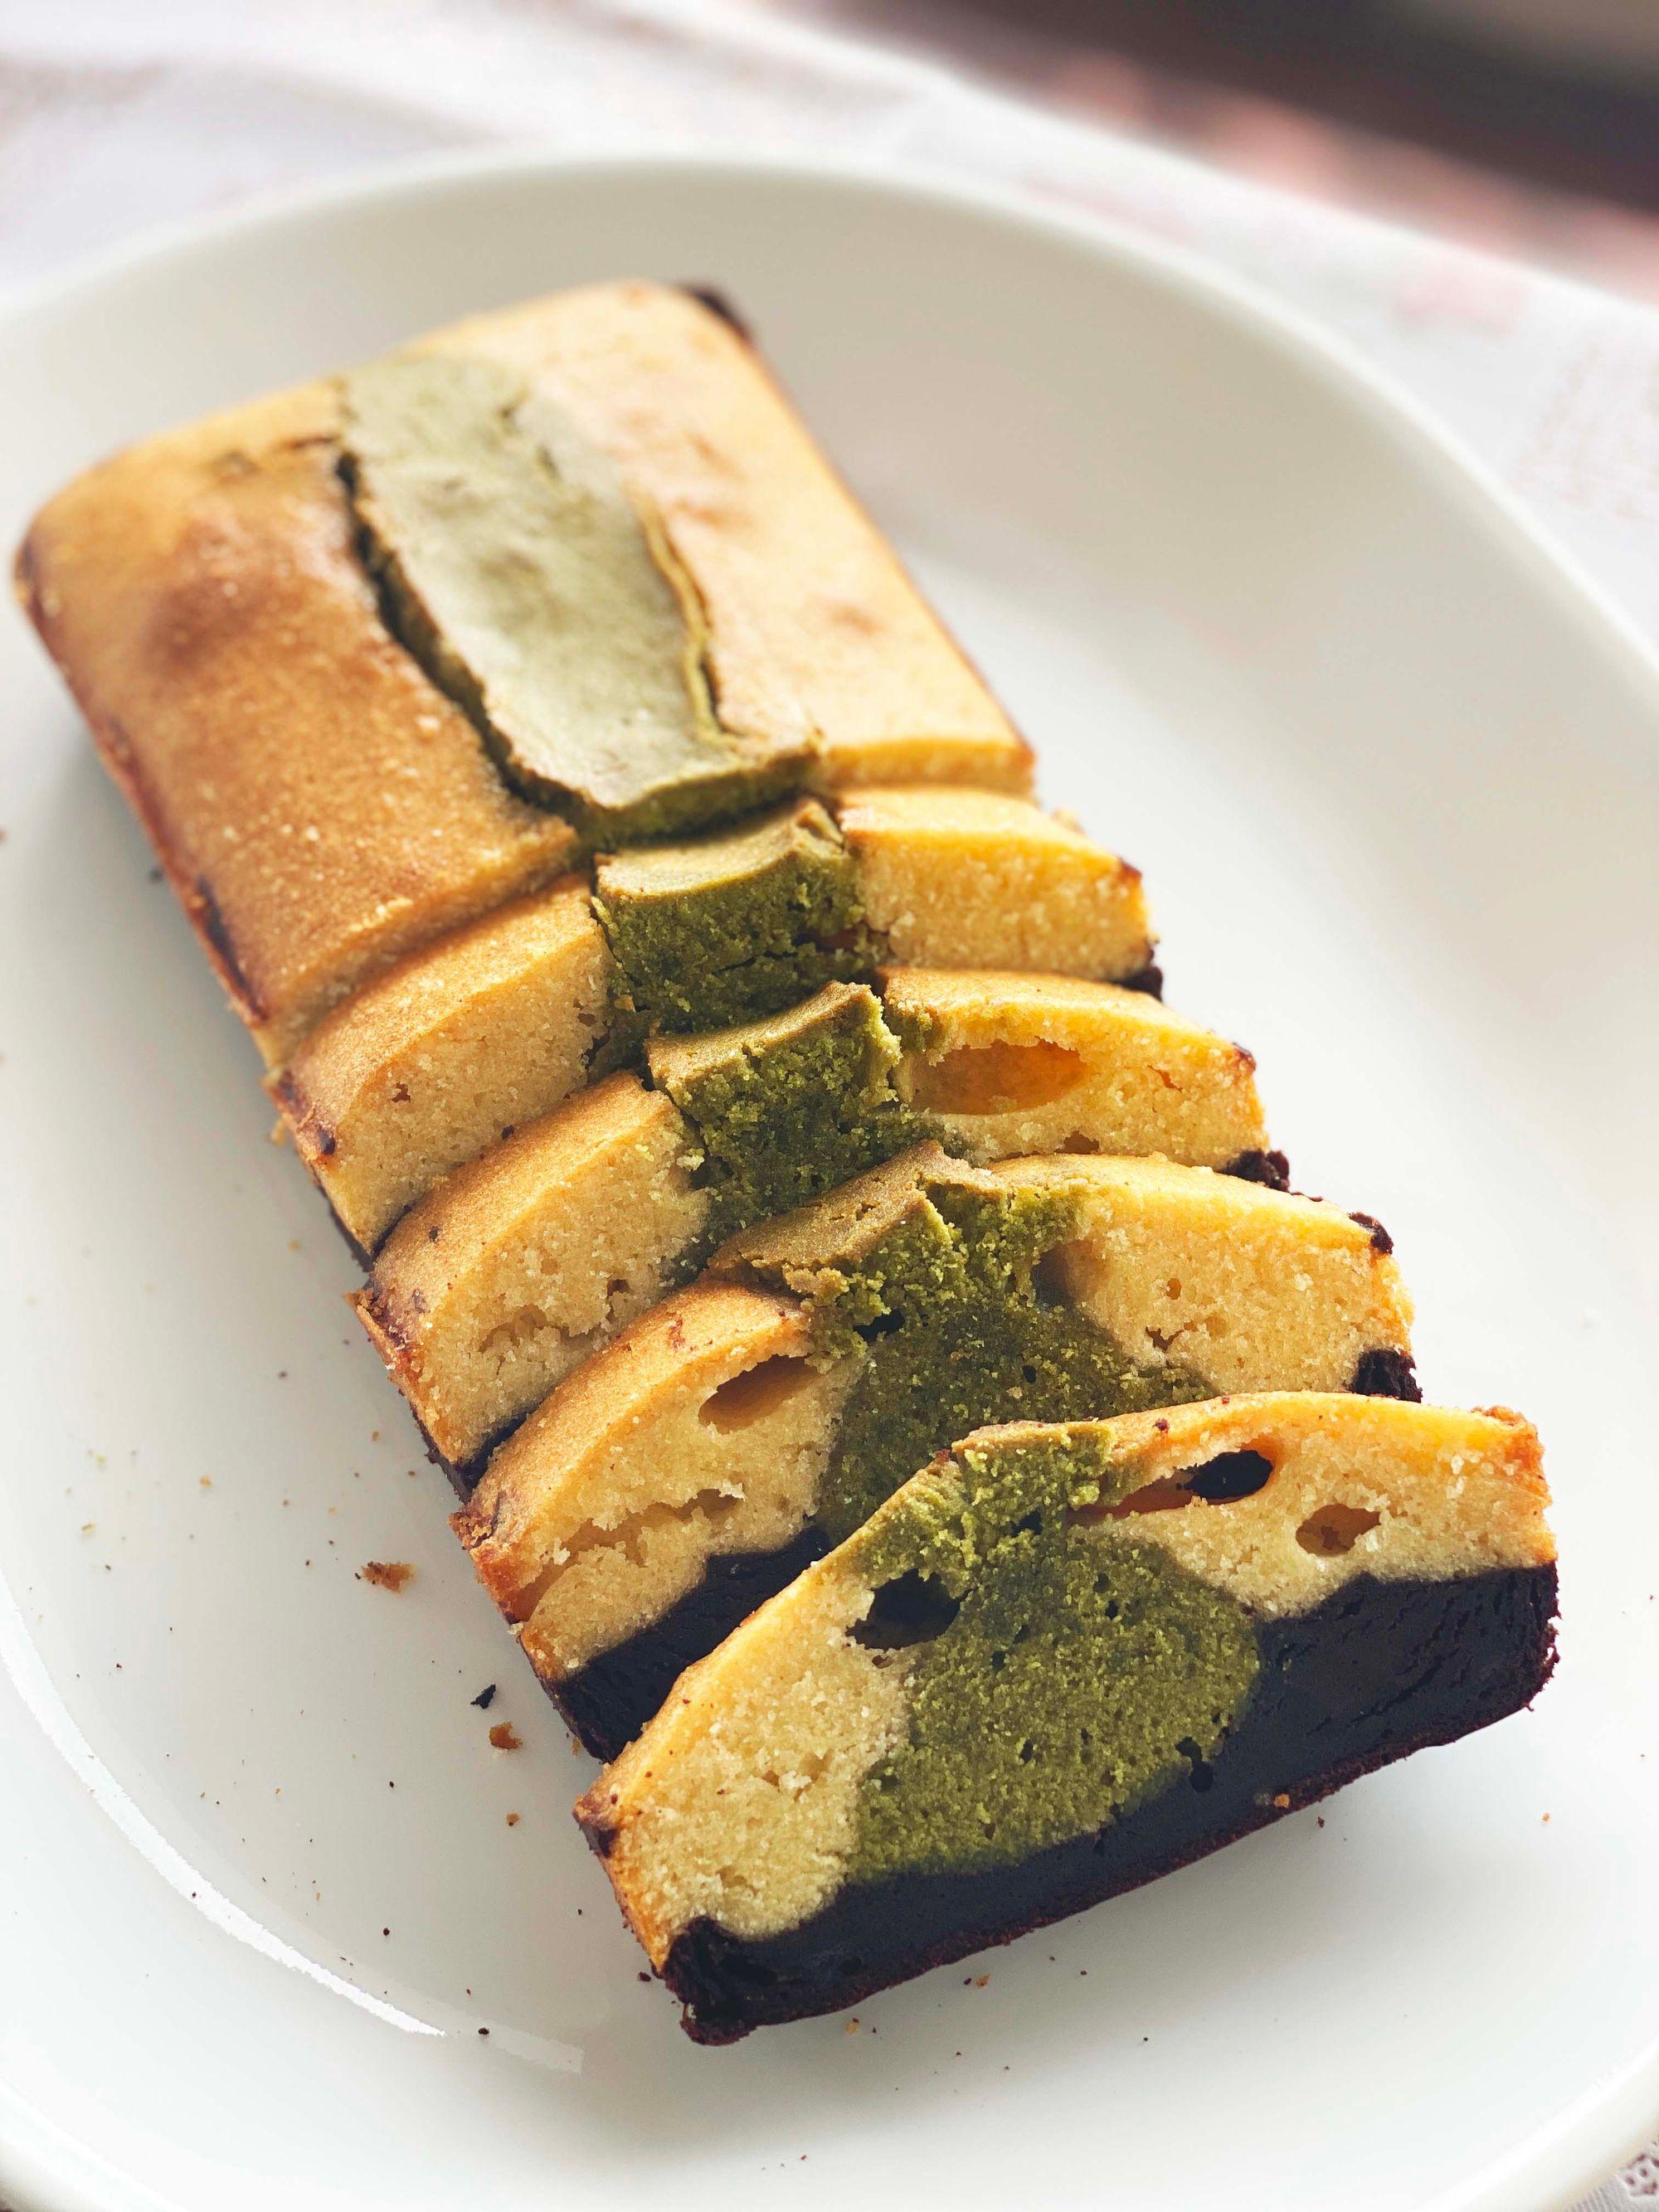 Matcha Green Tea Chocolate Butter Pound Cake